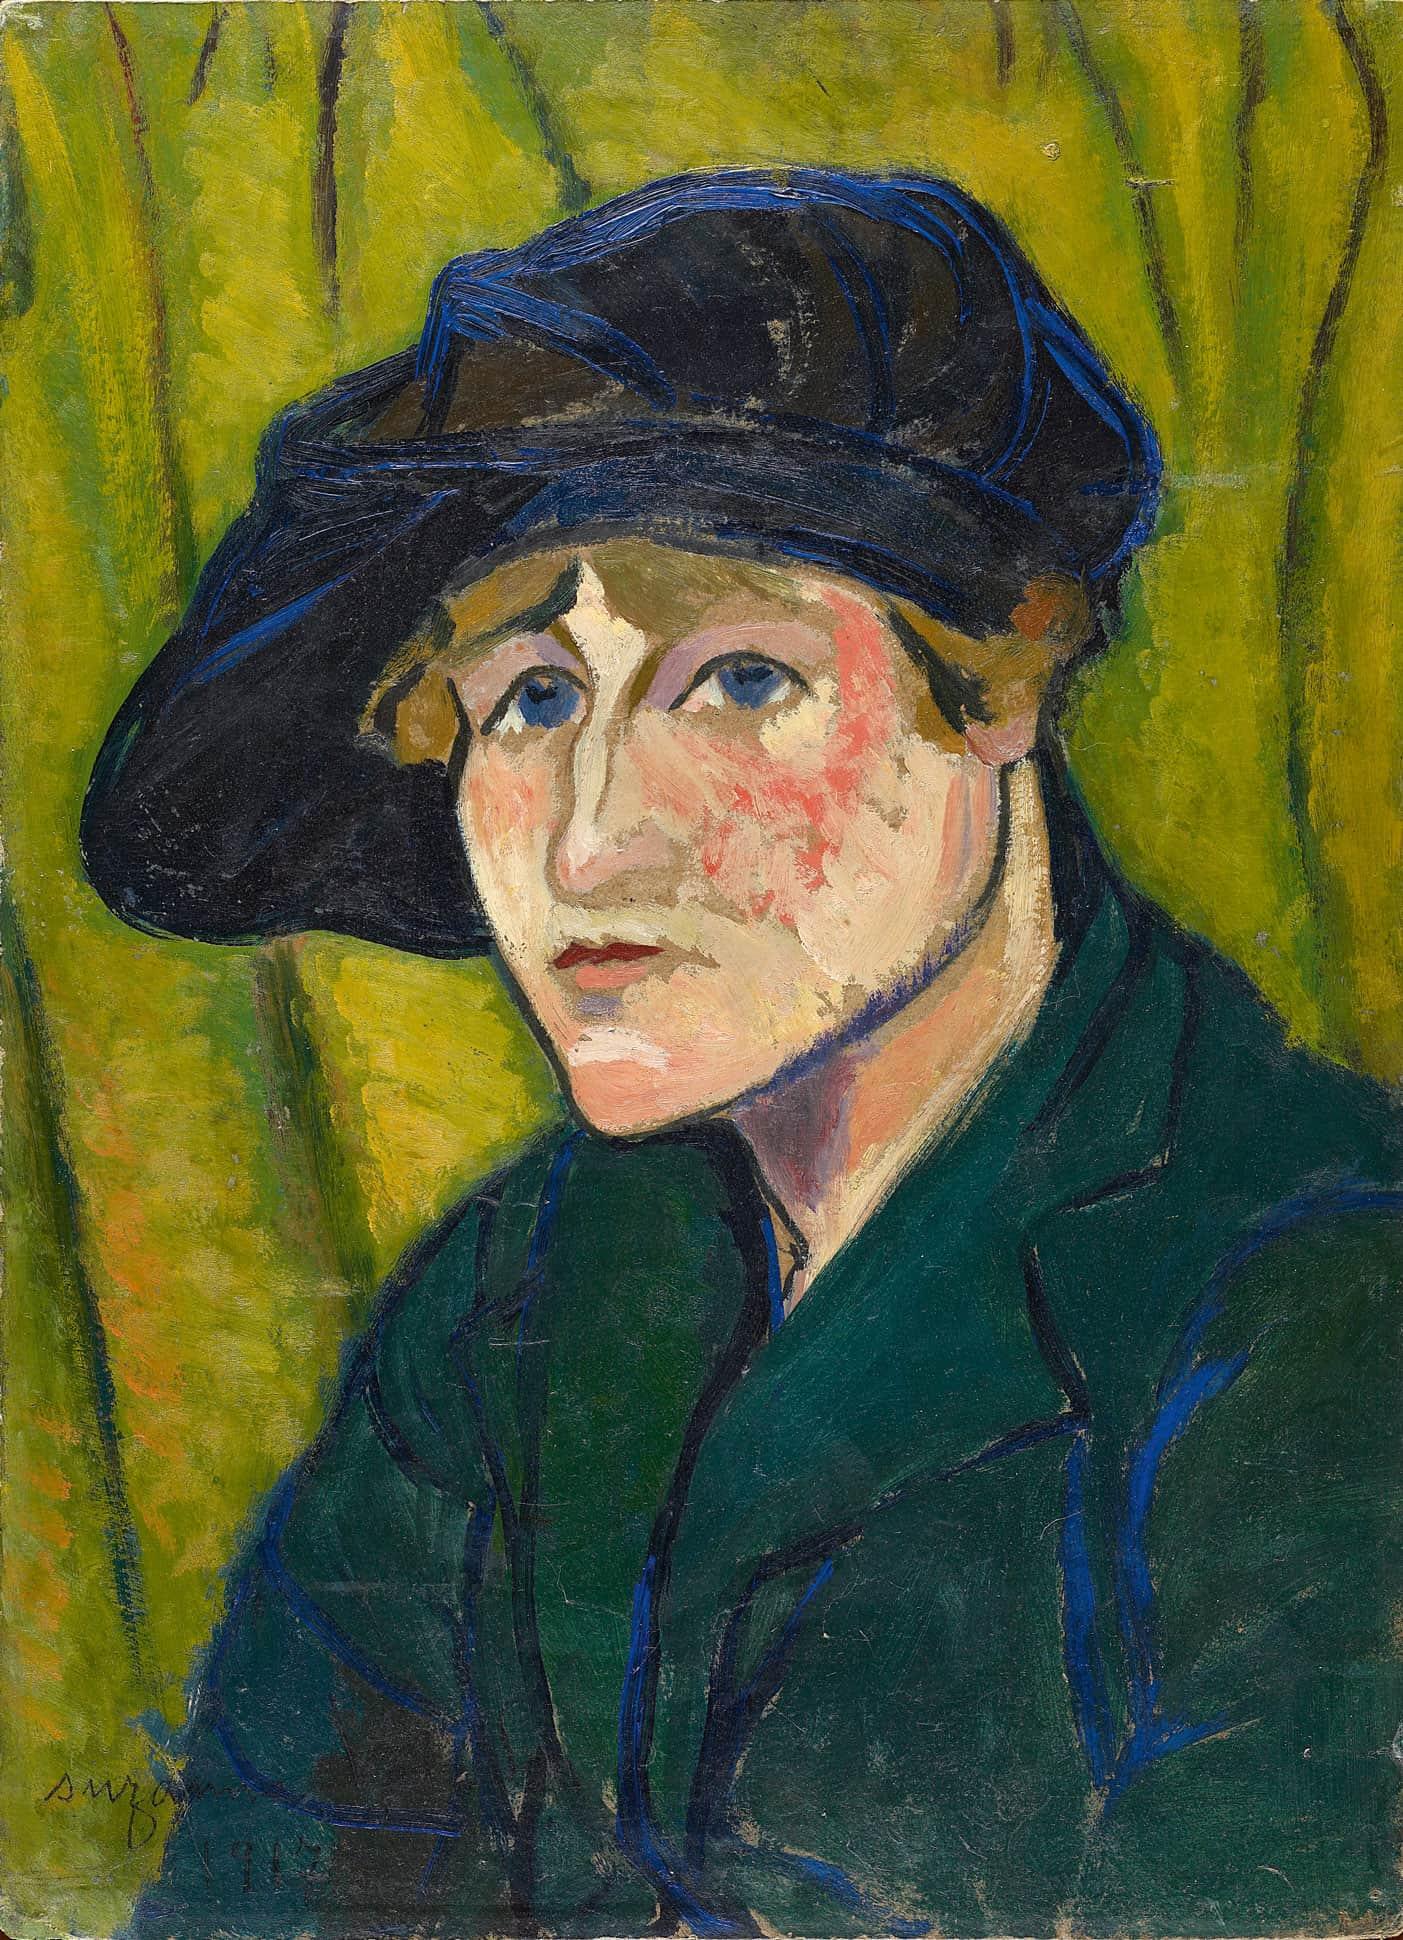 Suzanne Valadon (1917) de Amadeo Modigliani.